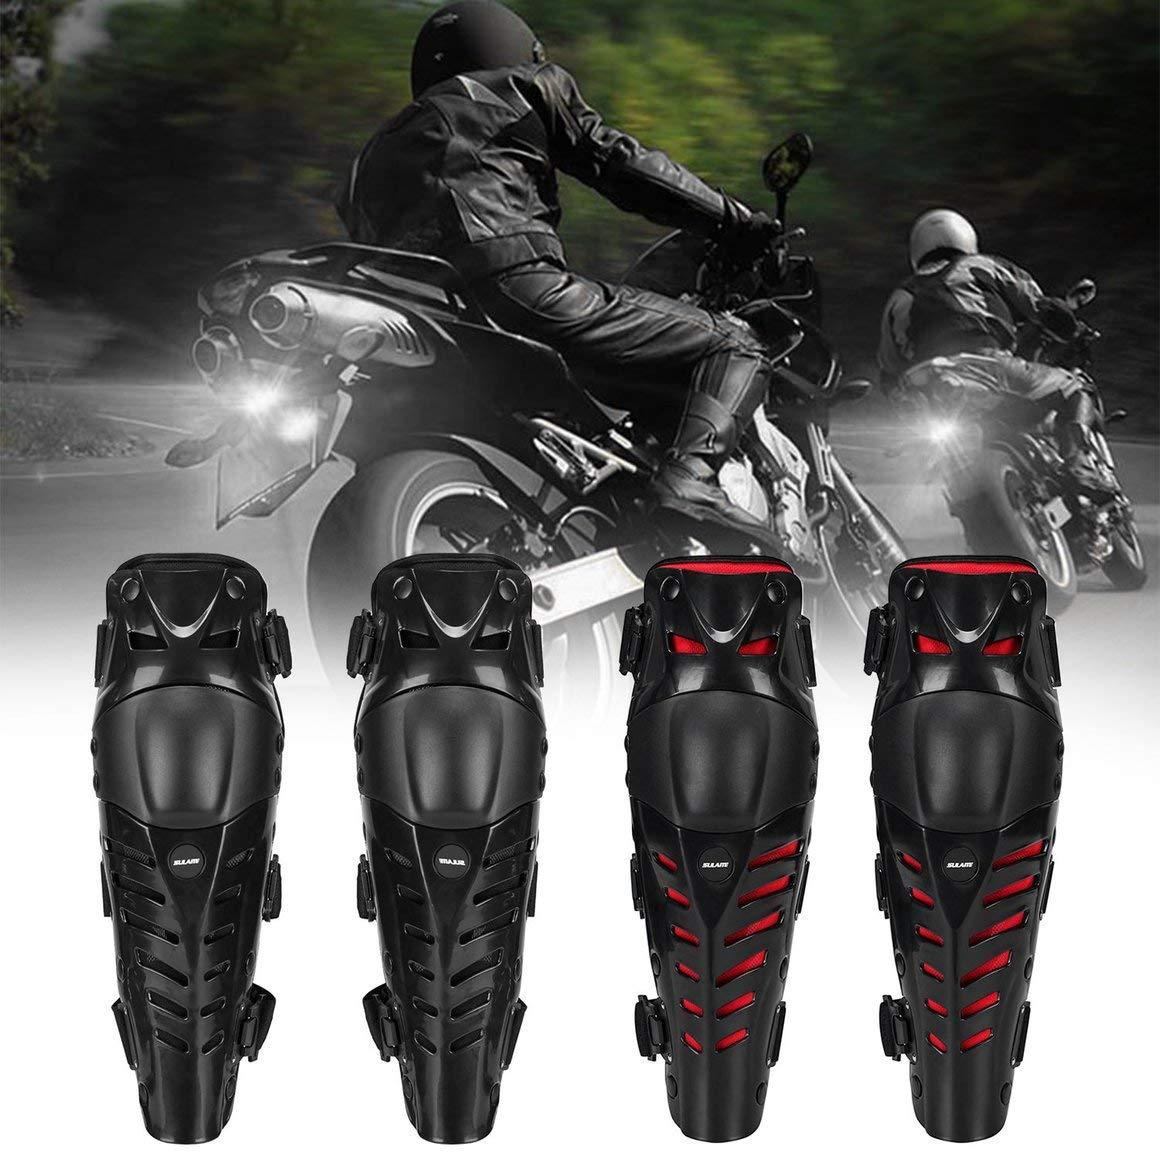 Color: Negro y Rojo Funnyrunstore 1 Par Motocicleta Rodilleras Proteger Motocross Motocicleta Riding Racing Protective Gear Proteger al Aire Libre Sport Safety Pads Guards